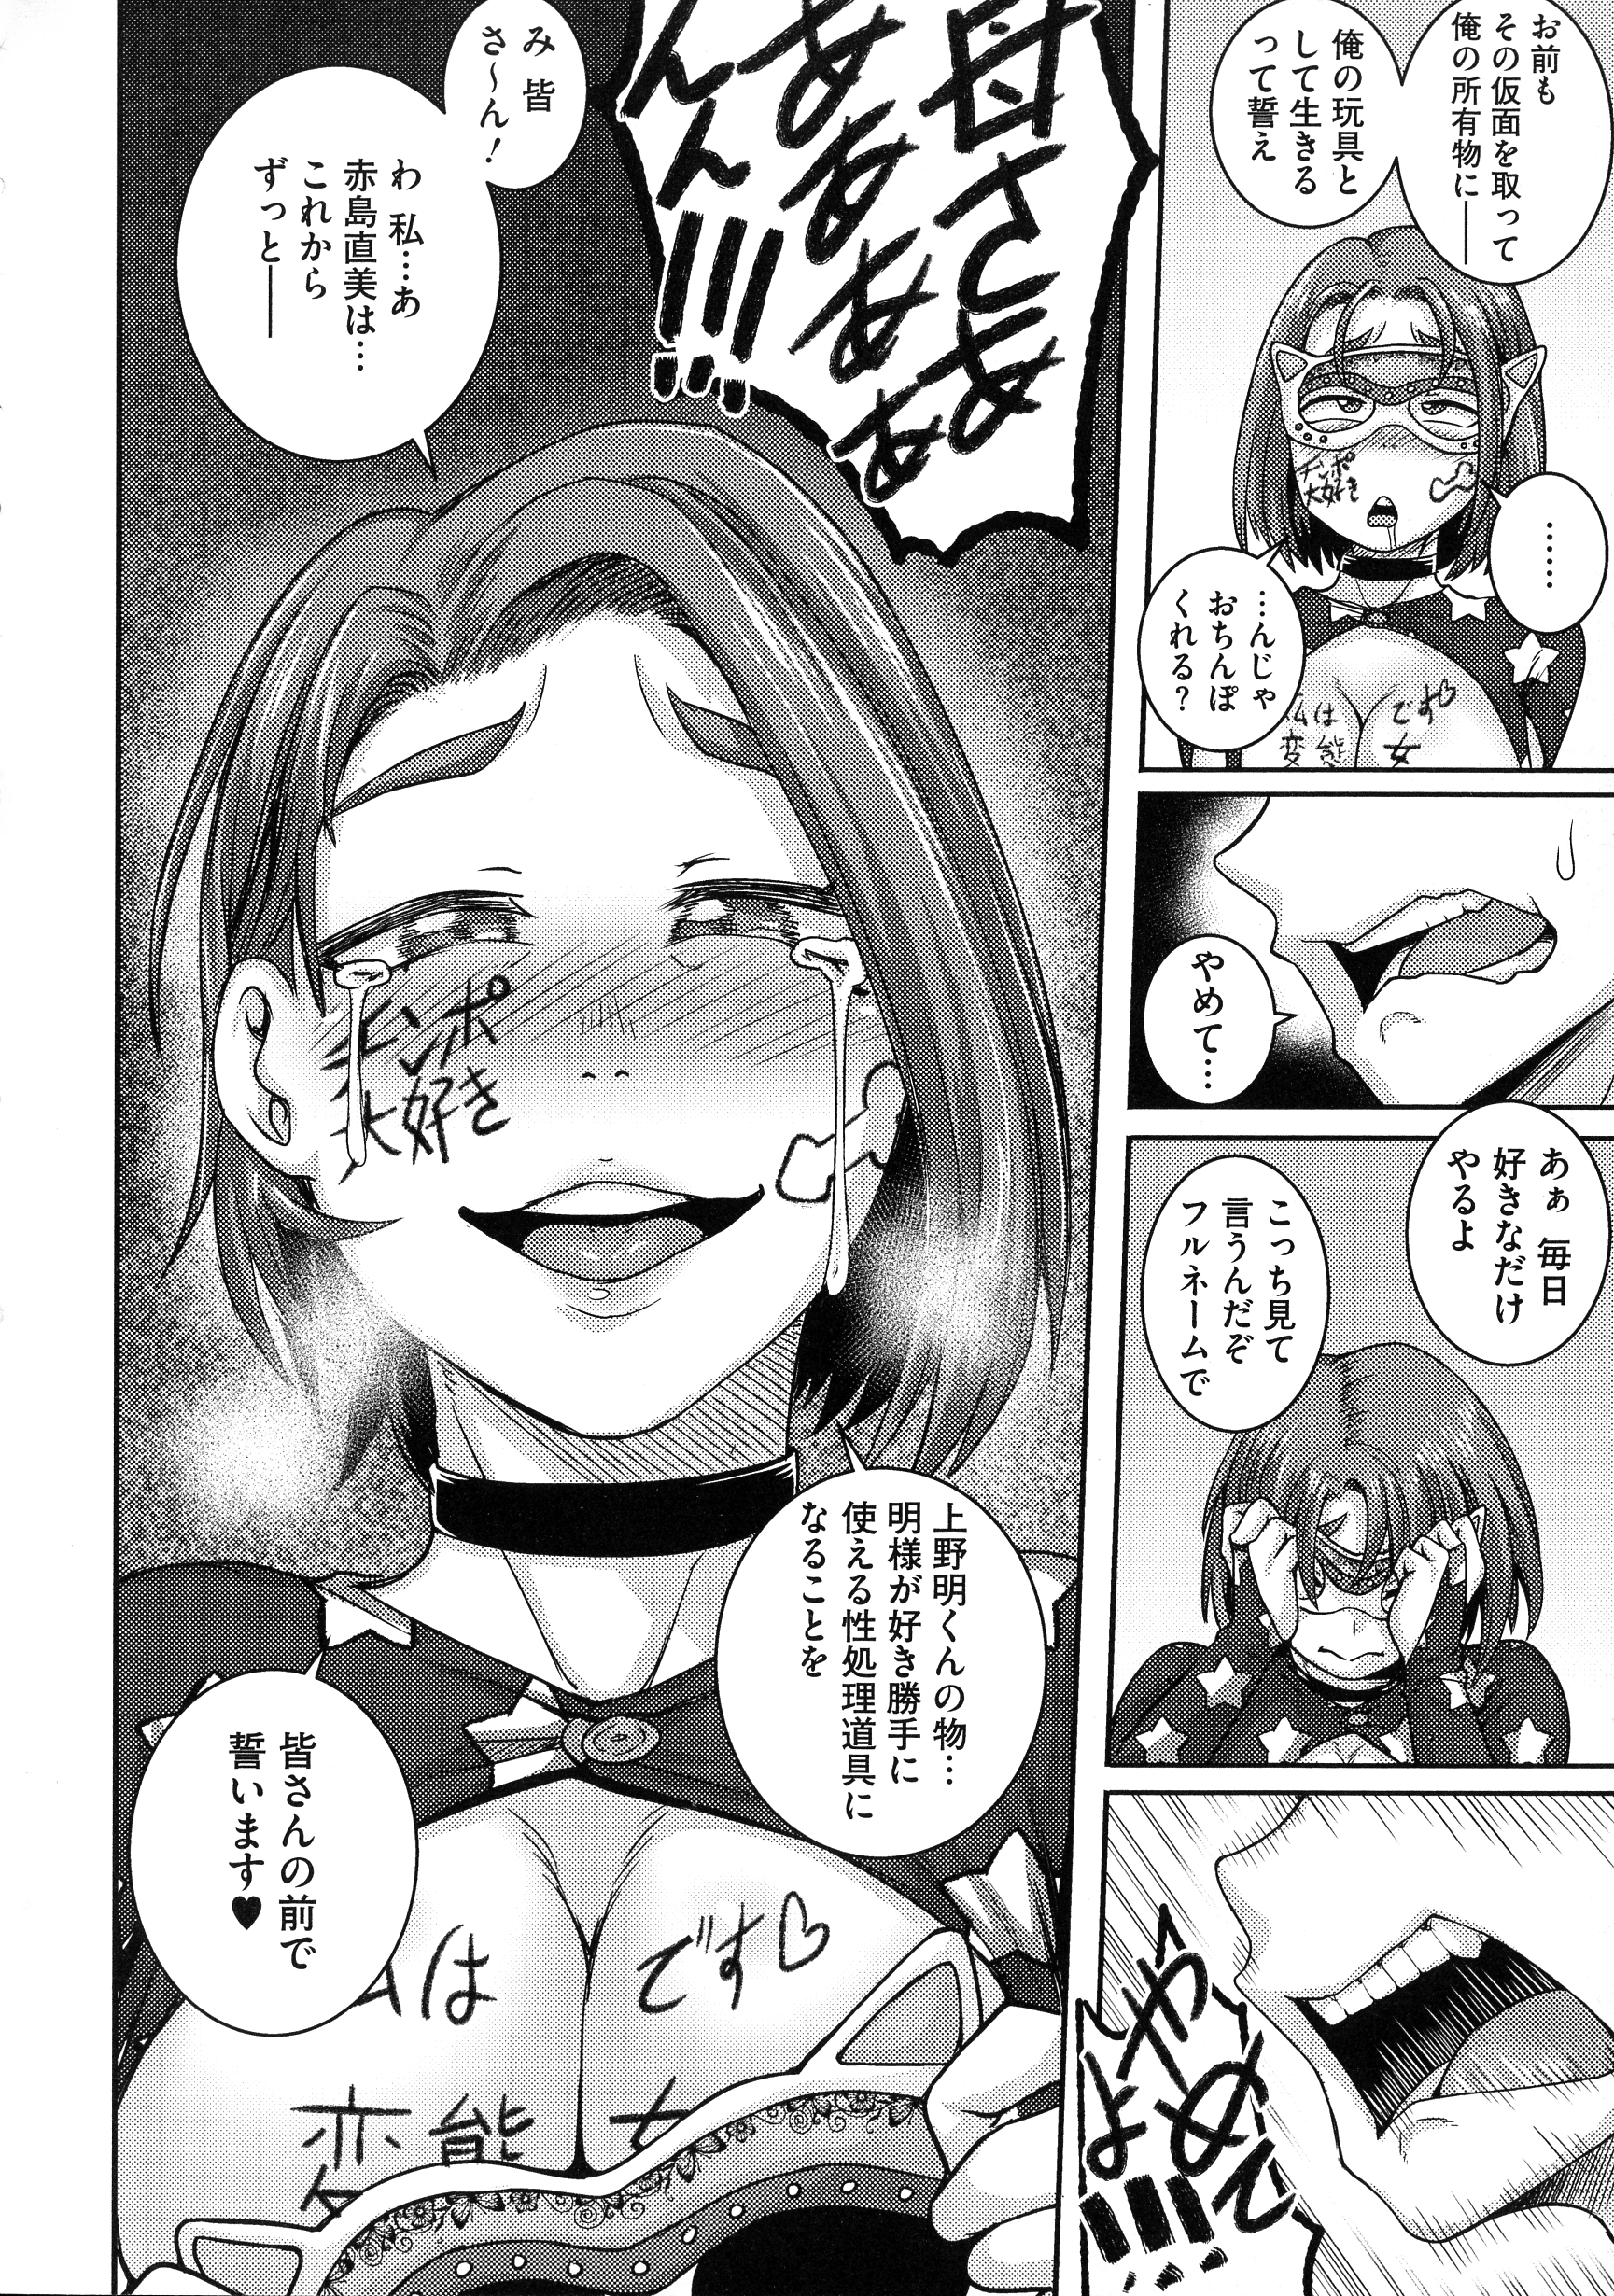 114 pg 112 2 07 Mi B